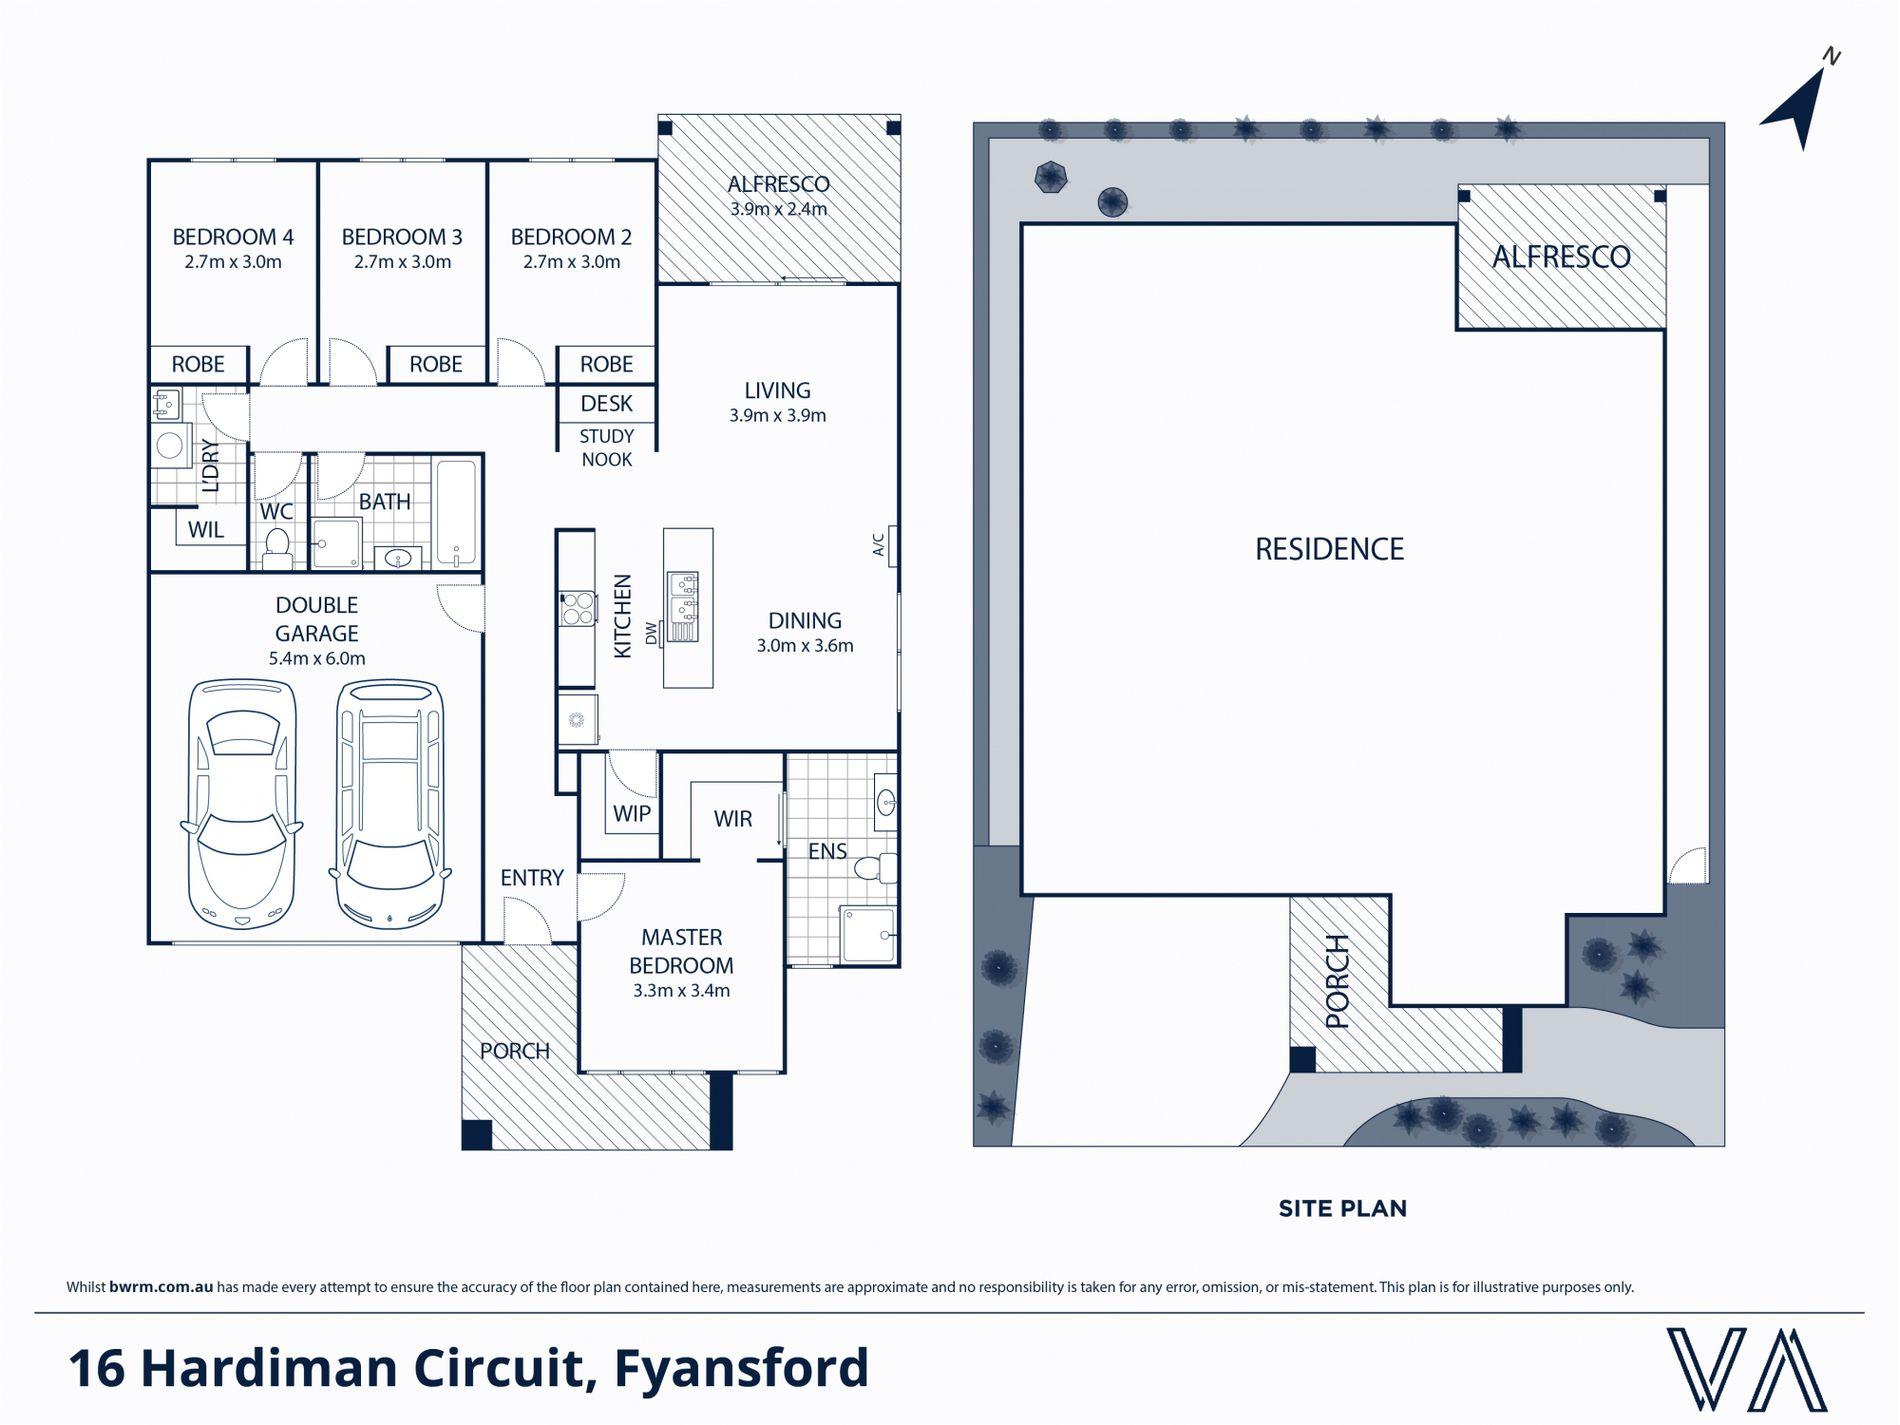 16 Hardiman Circuit, Fyansford